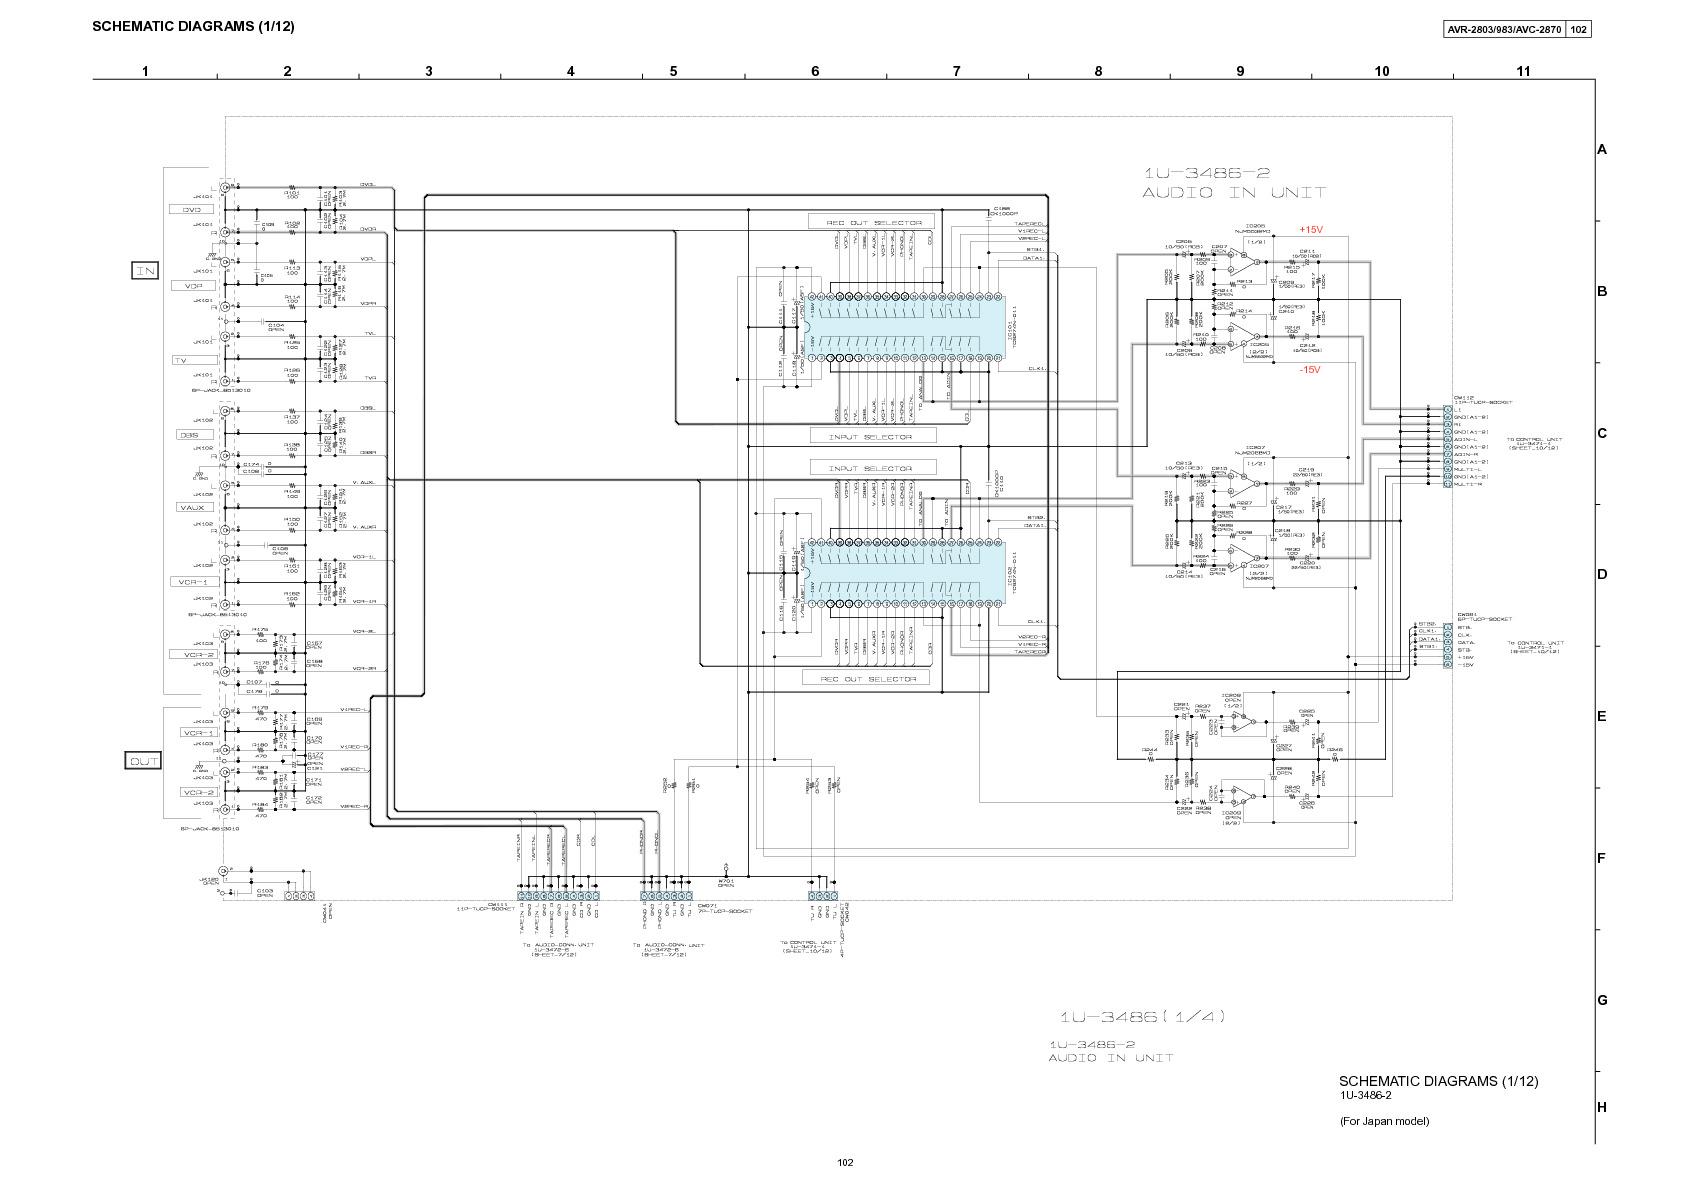 DENON AVR 2803 AVC 2870 JP SD V02 pdf DENON AVR 2803 AVC